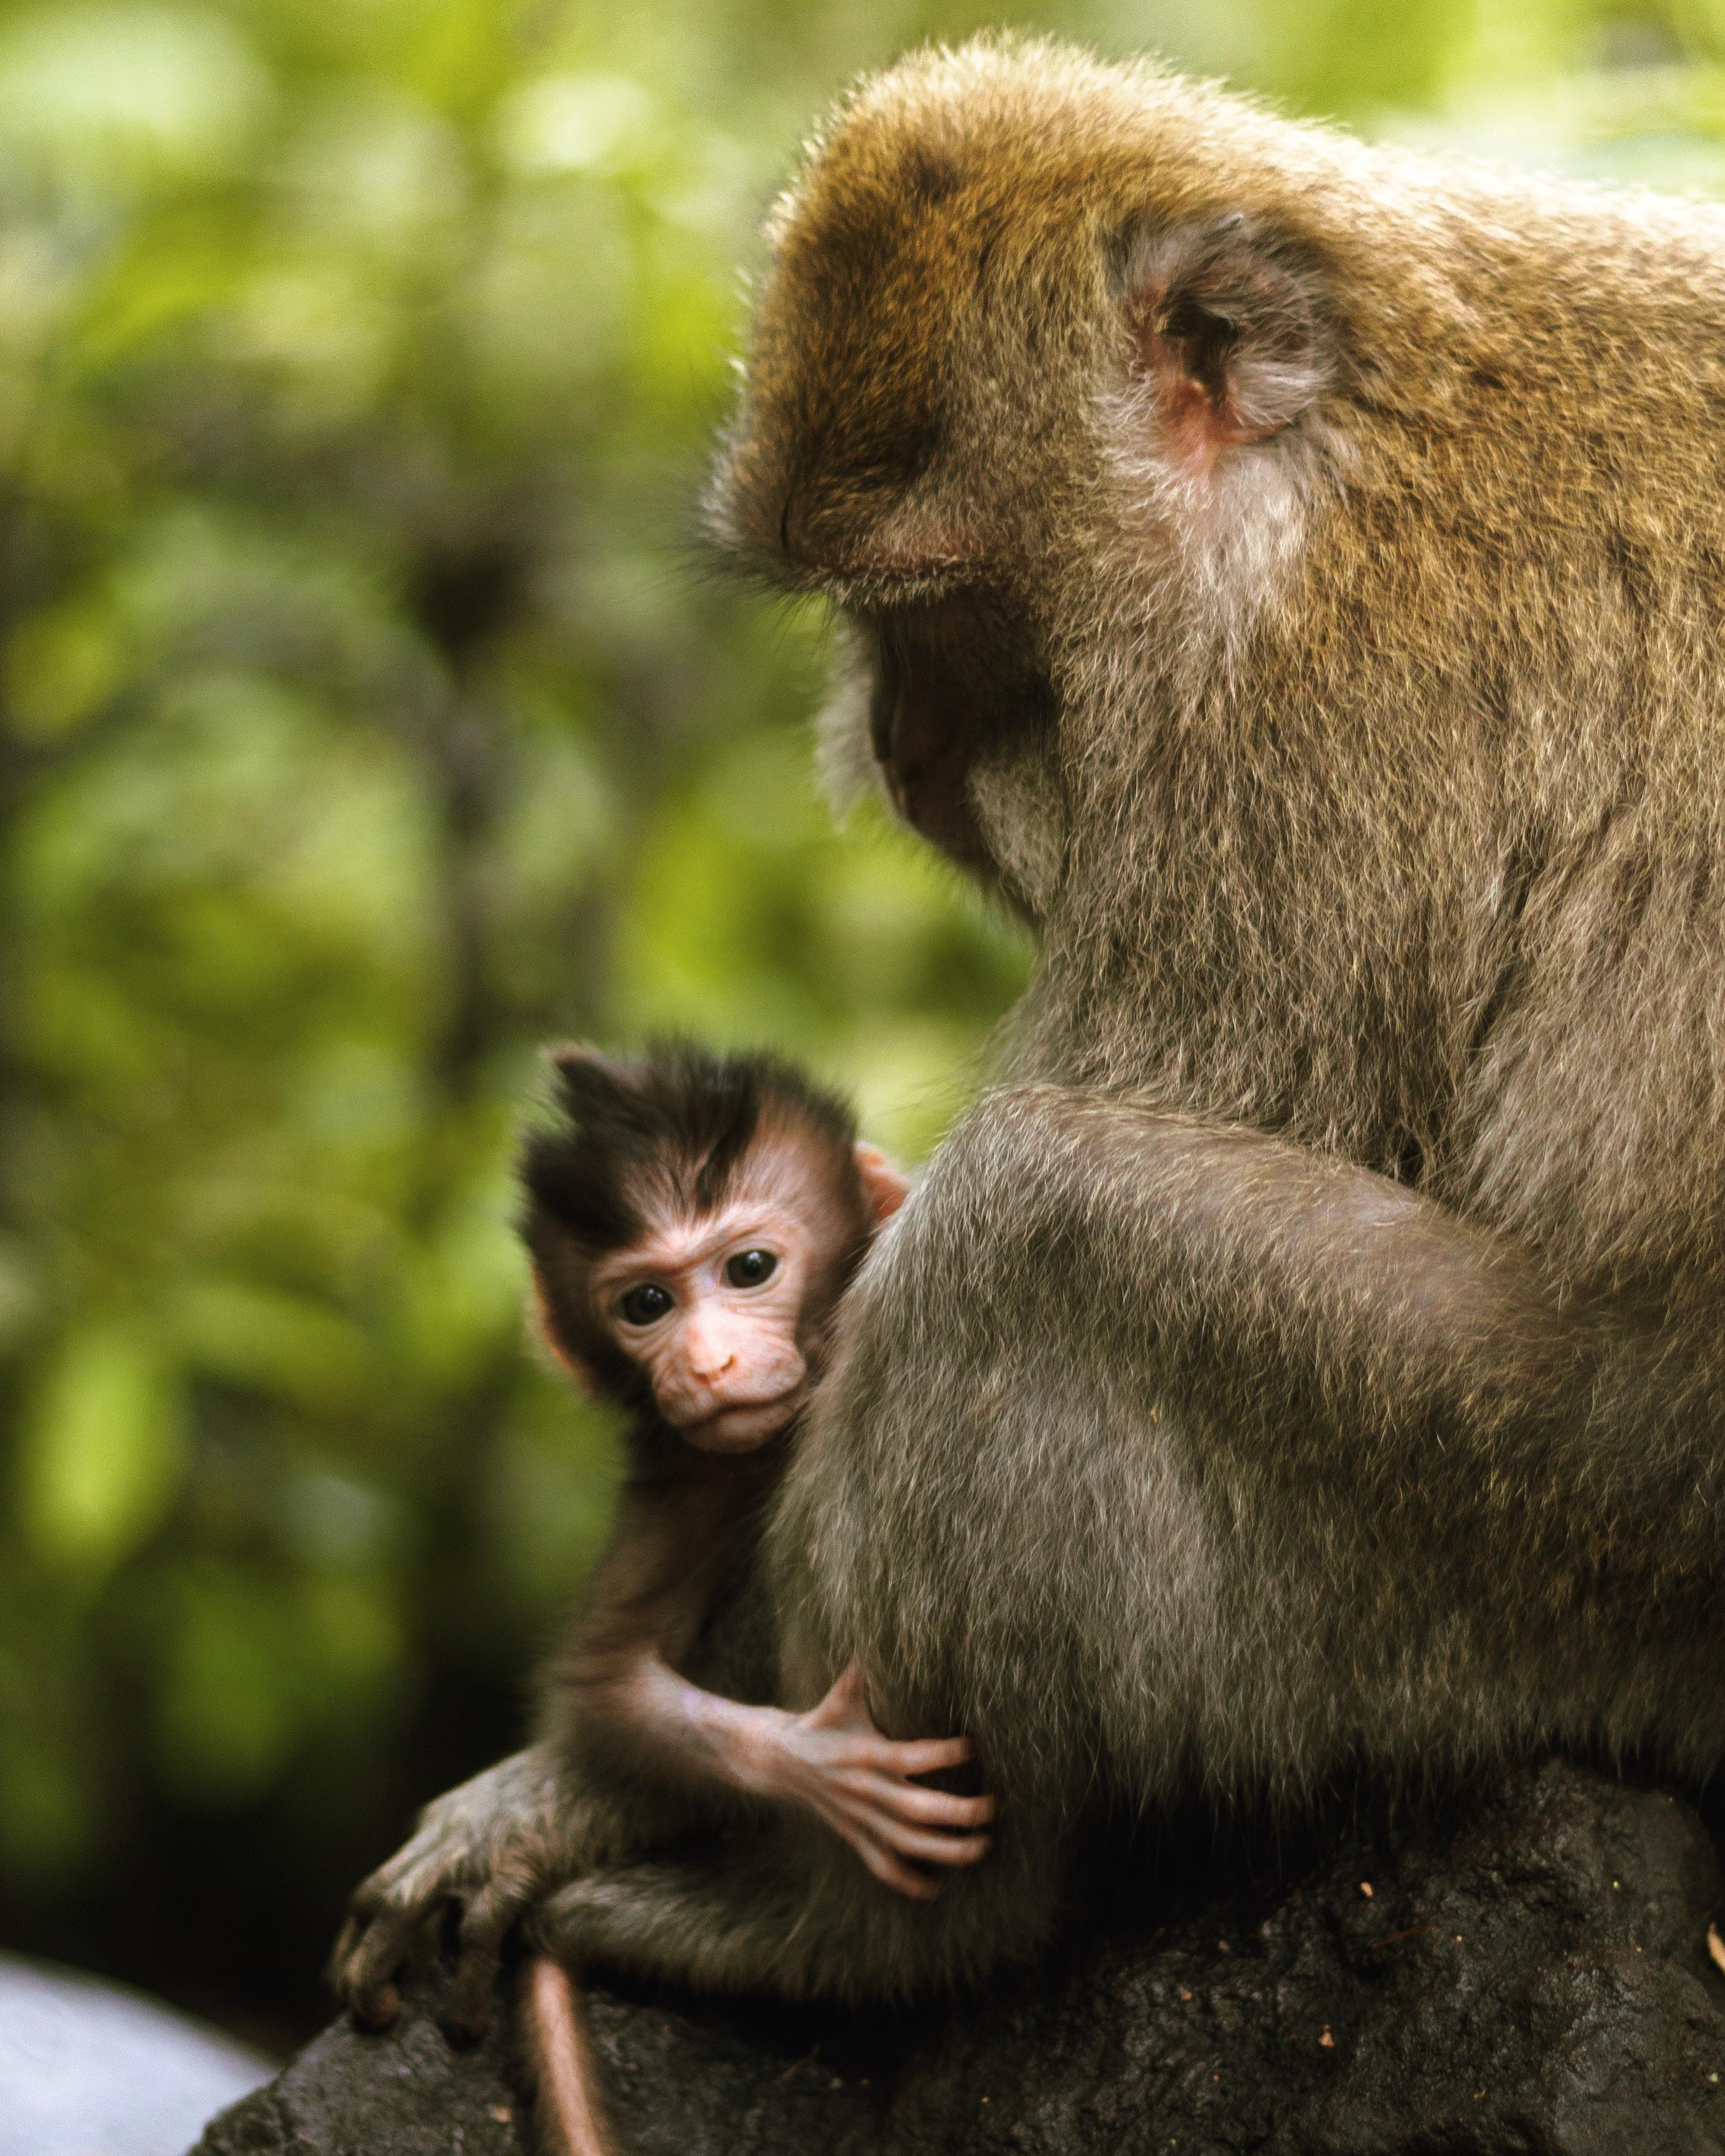 gray monkey carrying baby monkey during daytime